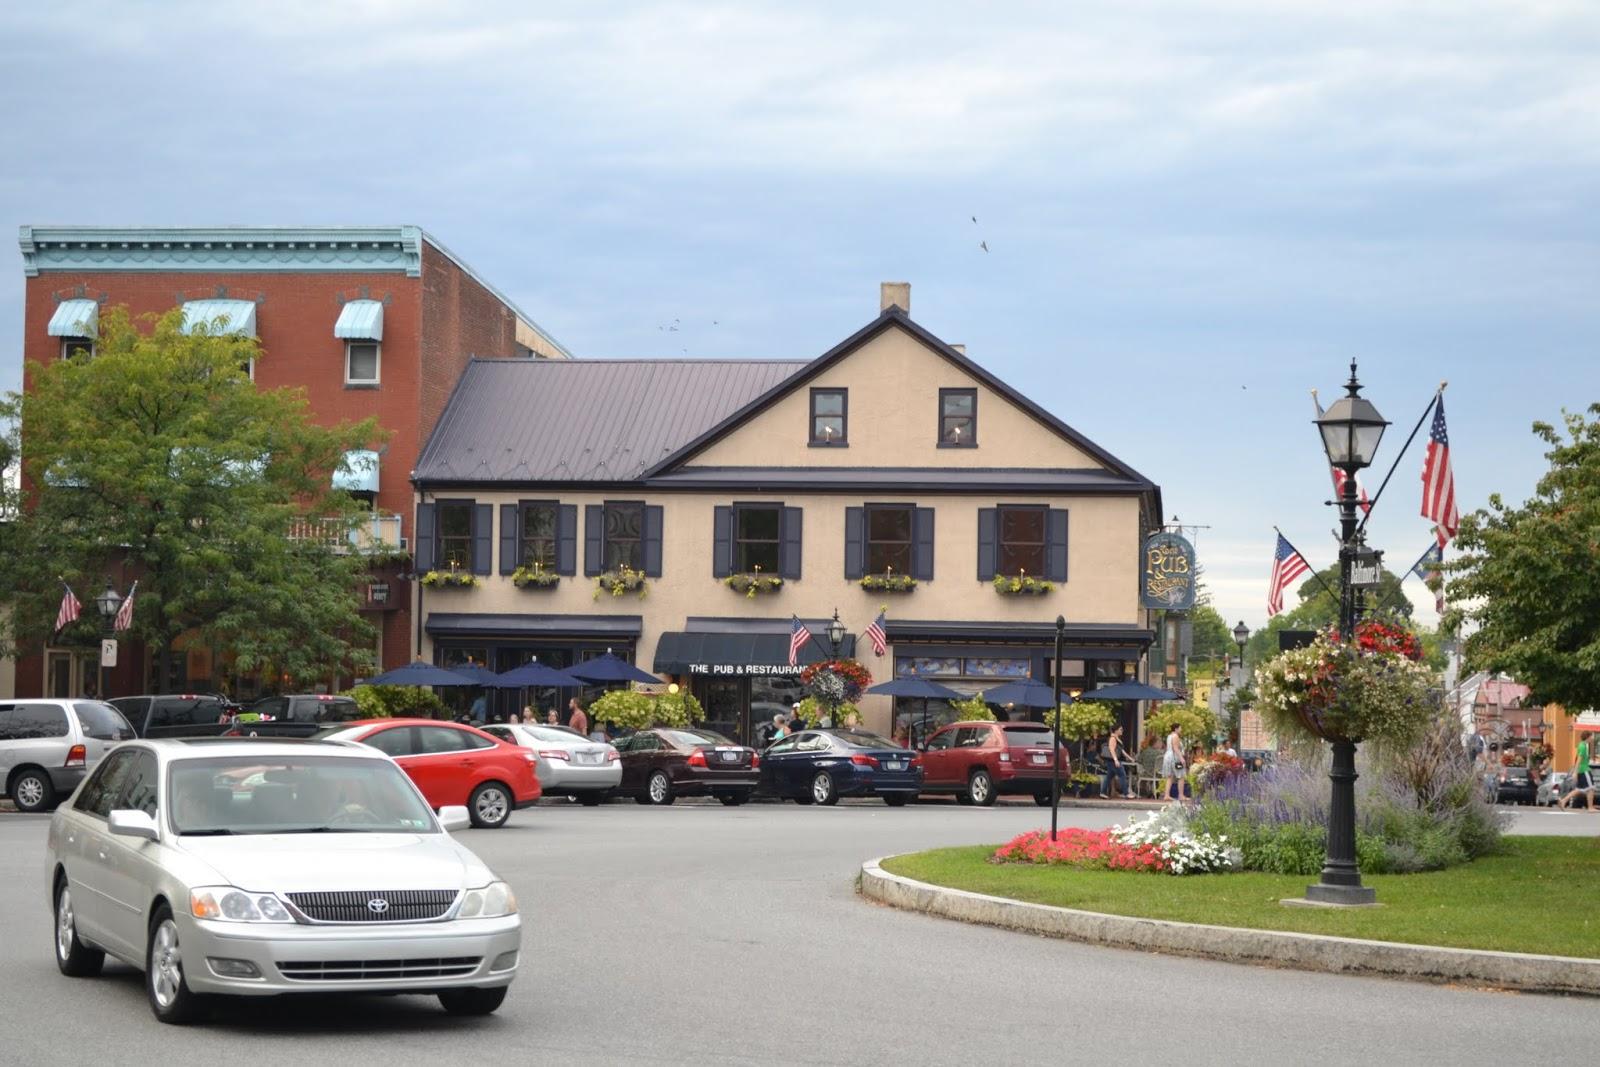 Геттисберг, Пенсильвания (Gettysburg, PA)